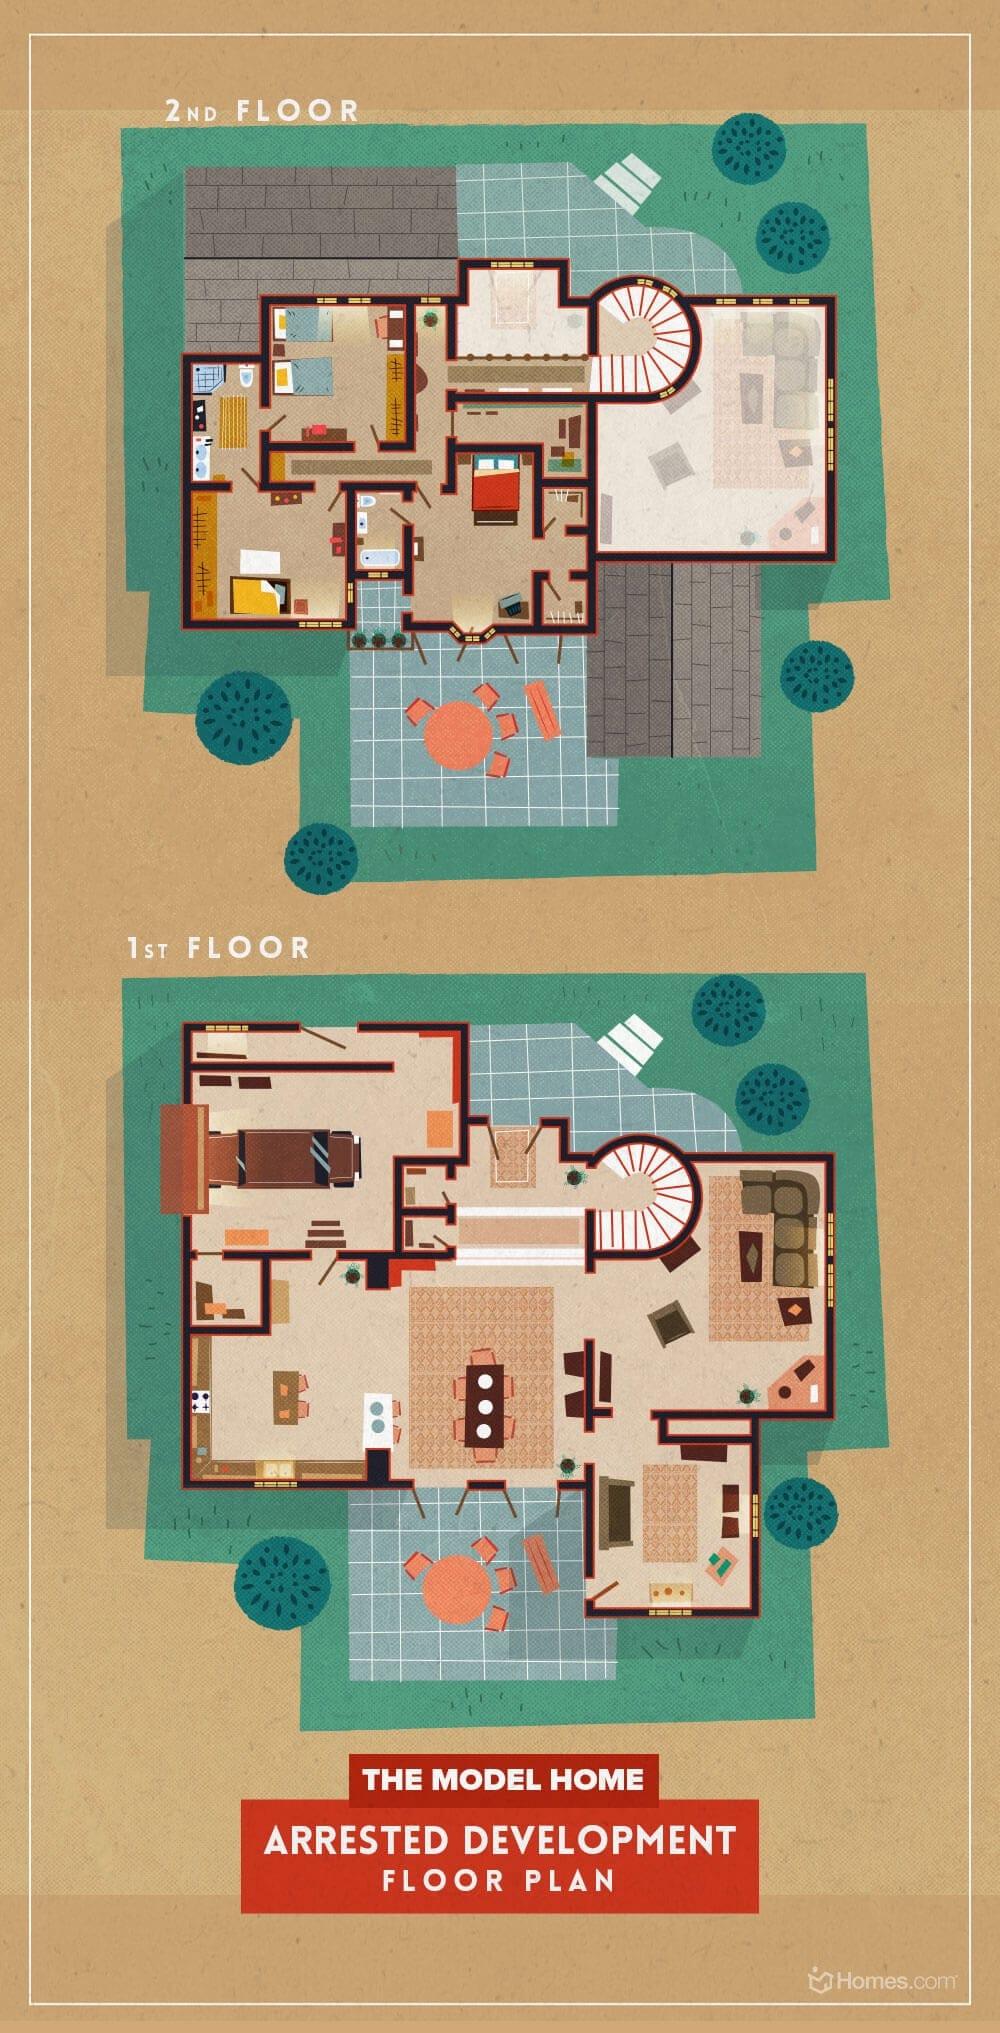 home-floor-plans-illustrations-1